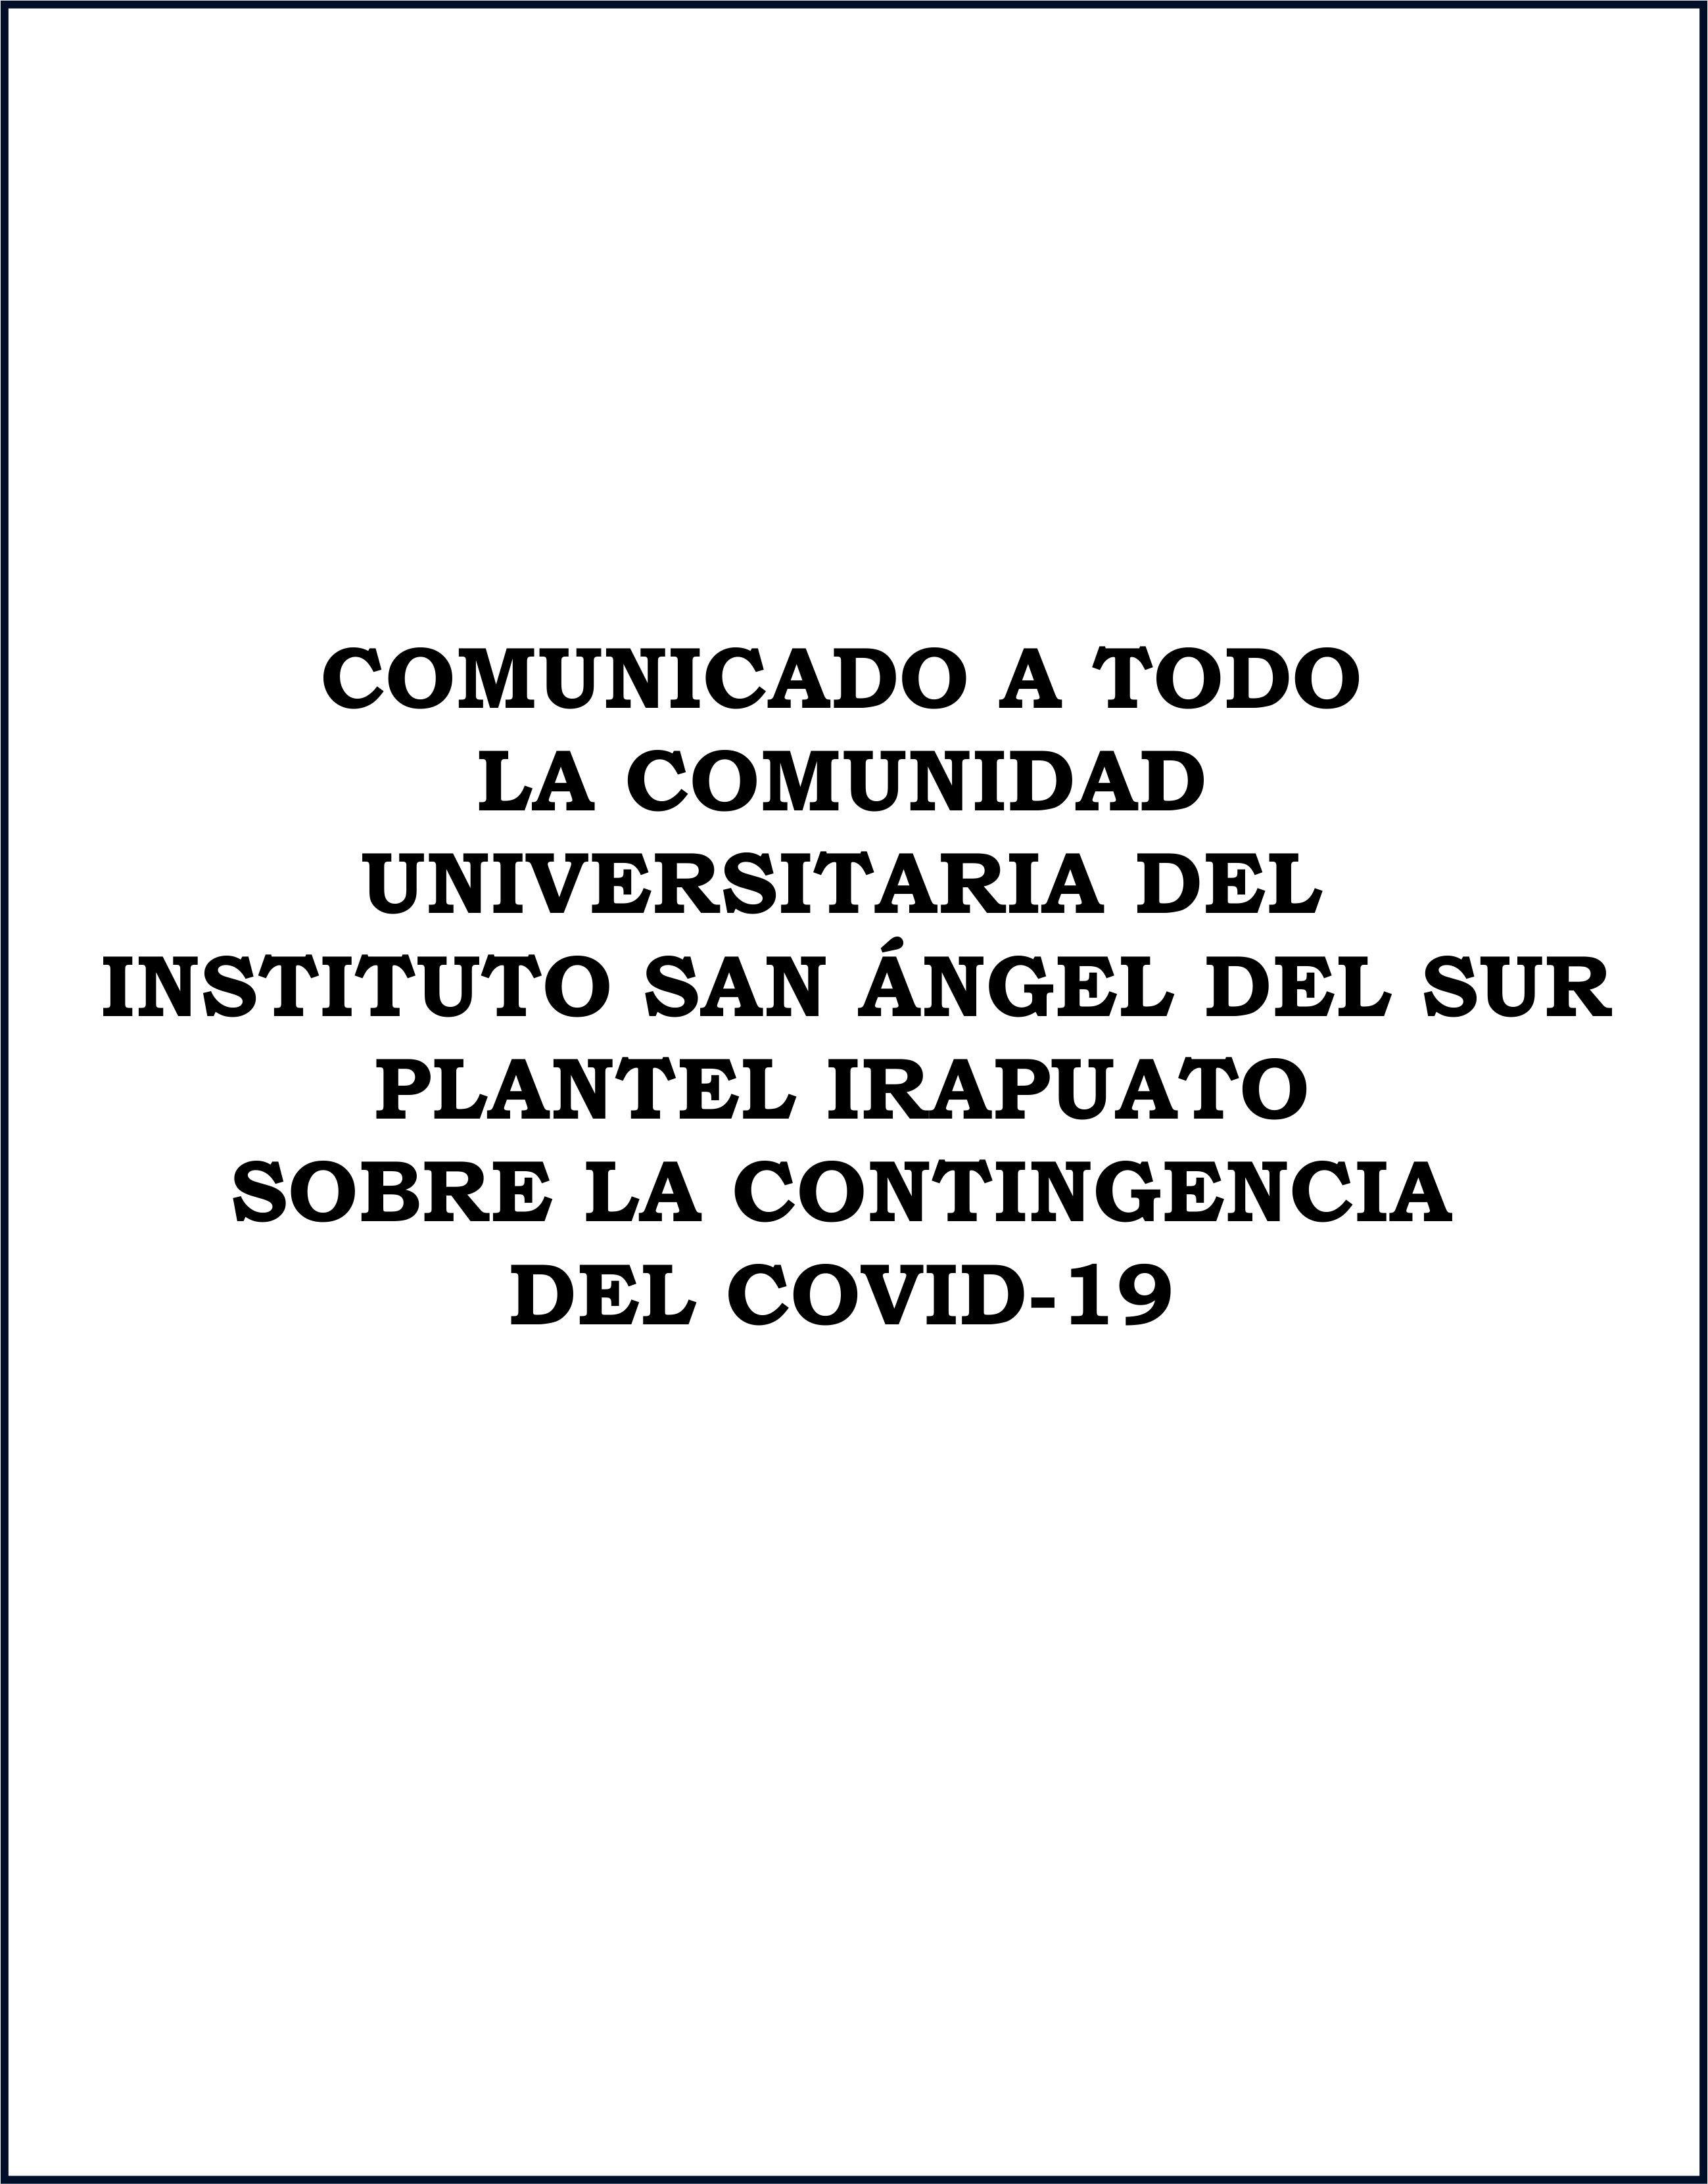 https://0201.nccdn.net/4_2/000/000/038/2d3/COVID2-2598x3323.jpg